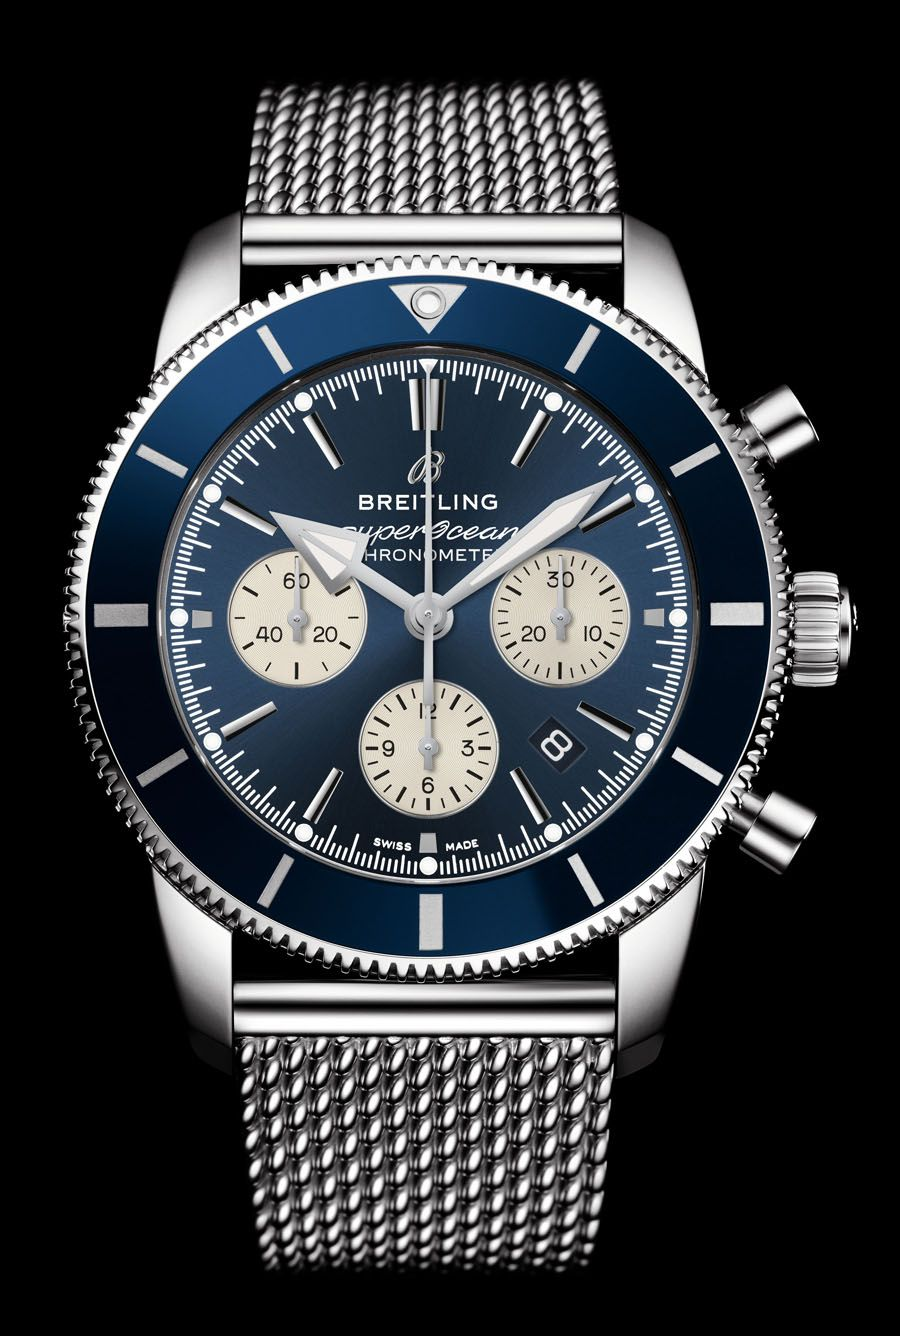 Breitling: Superocean Héritage II Chronograph 44 | Breitling